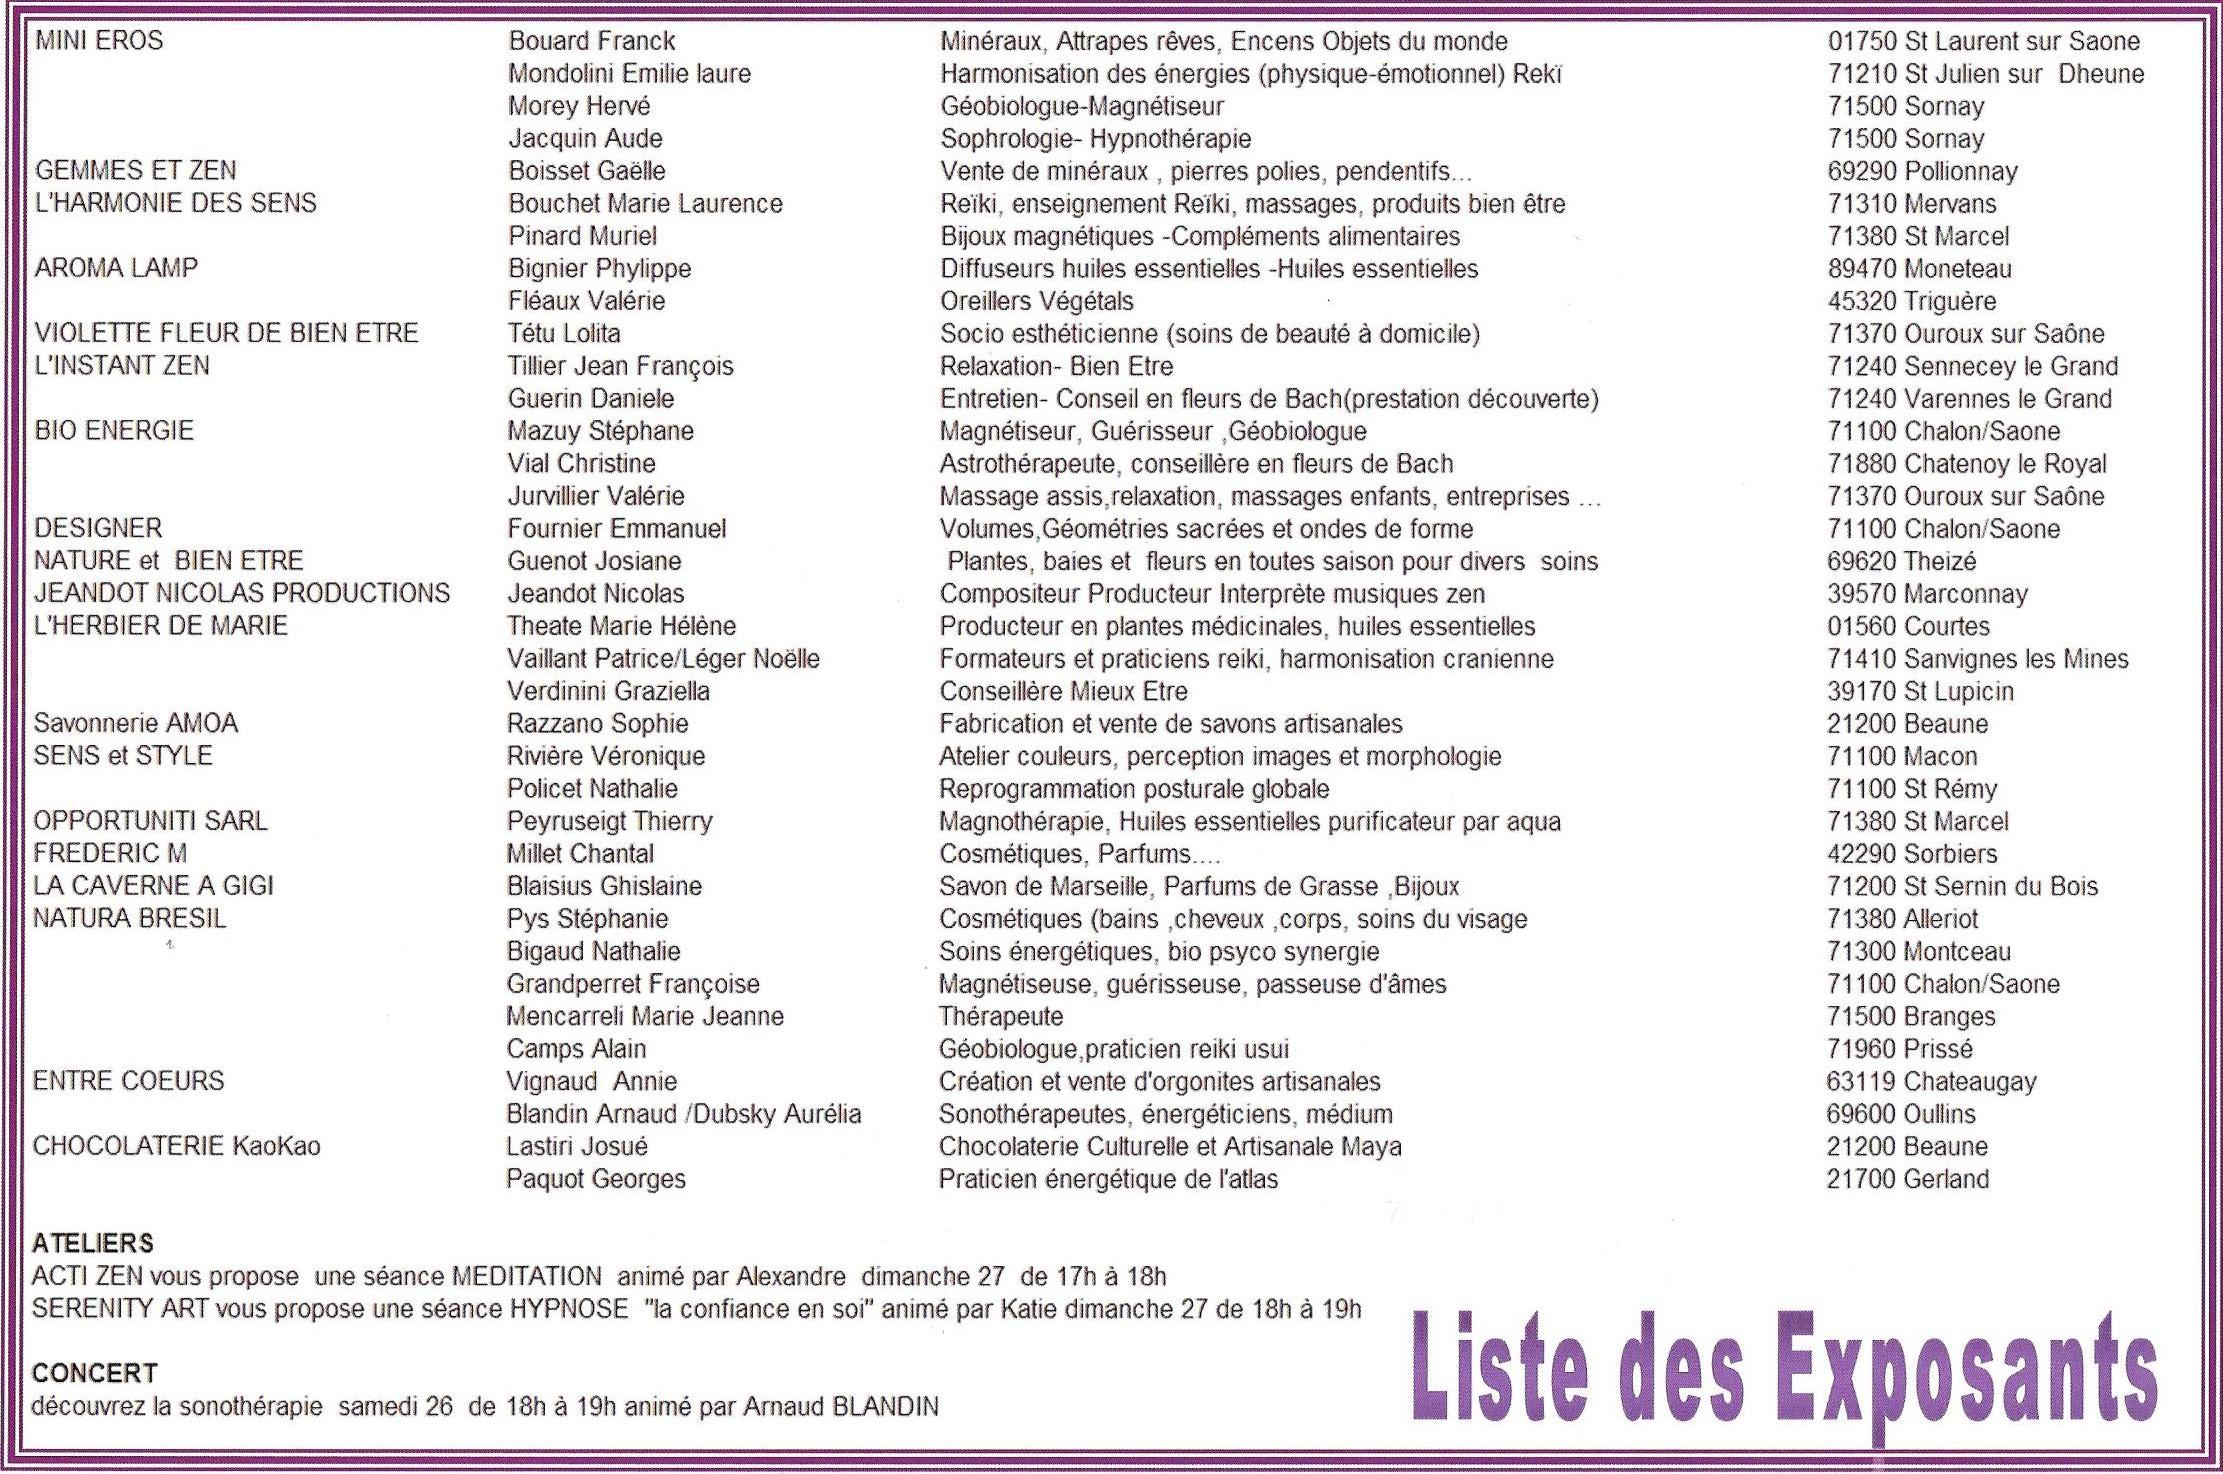 Liste des rencontres fdj